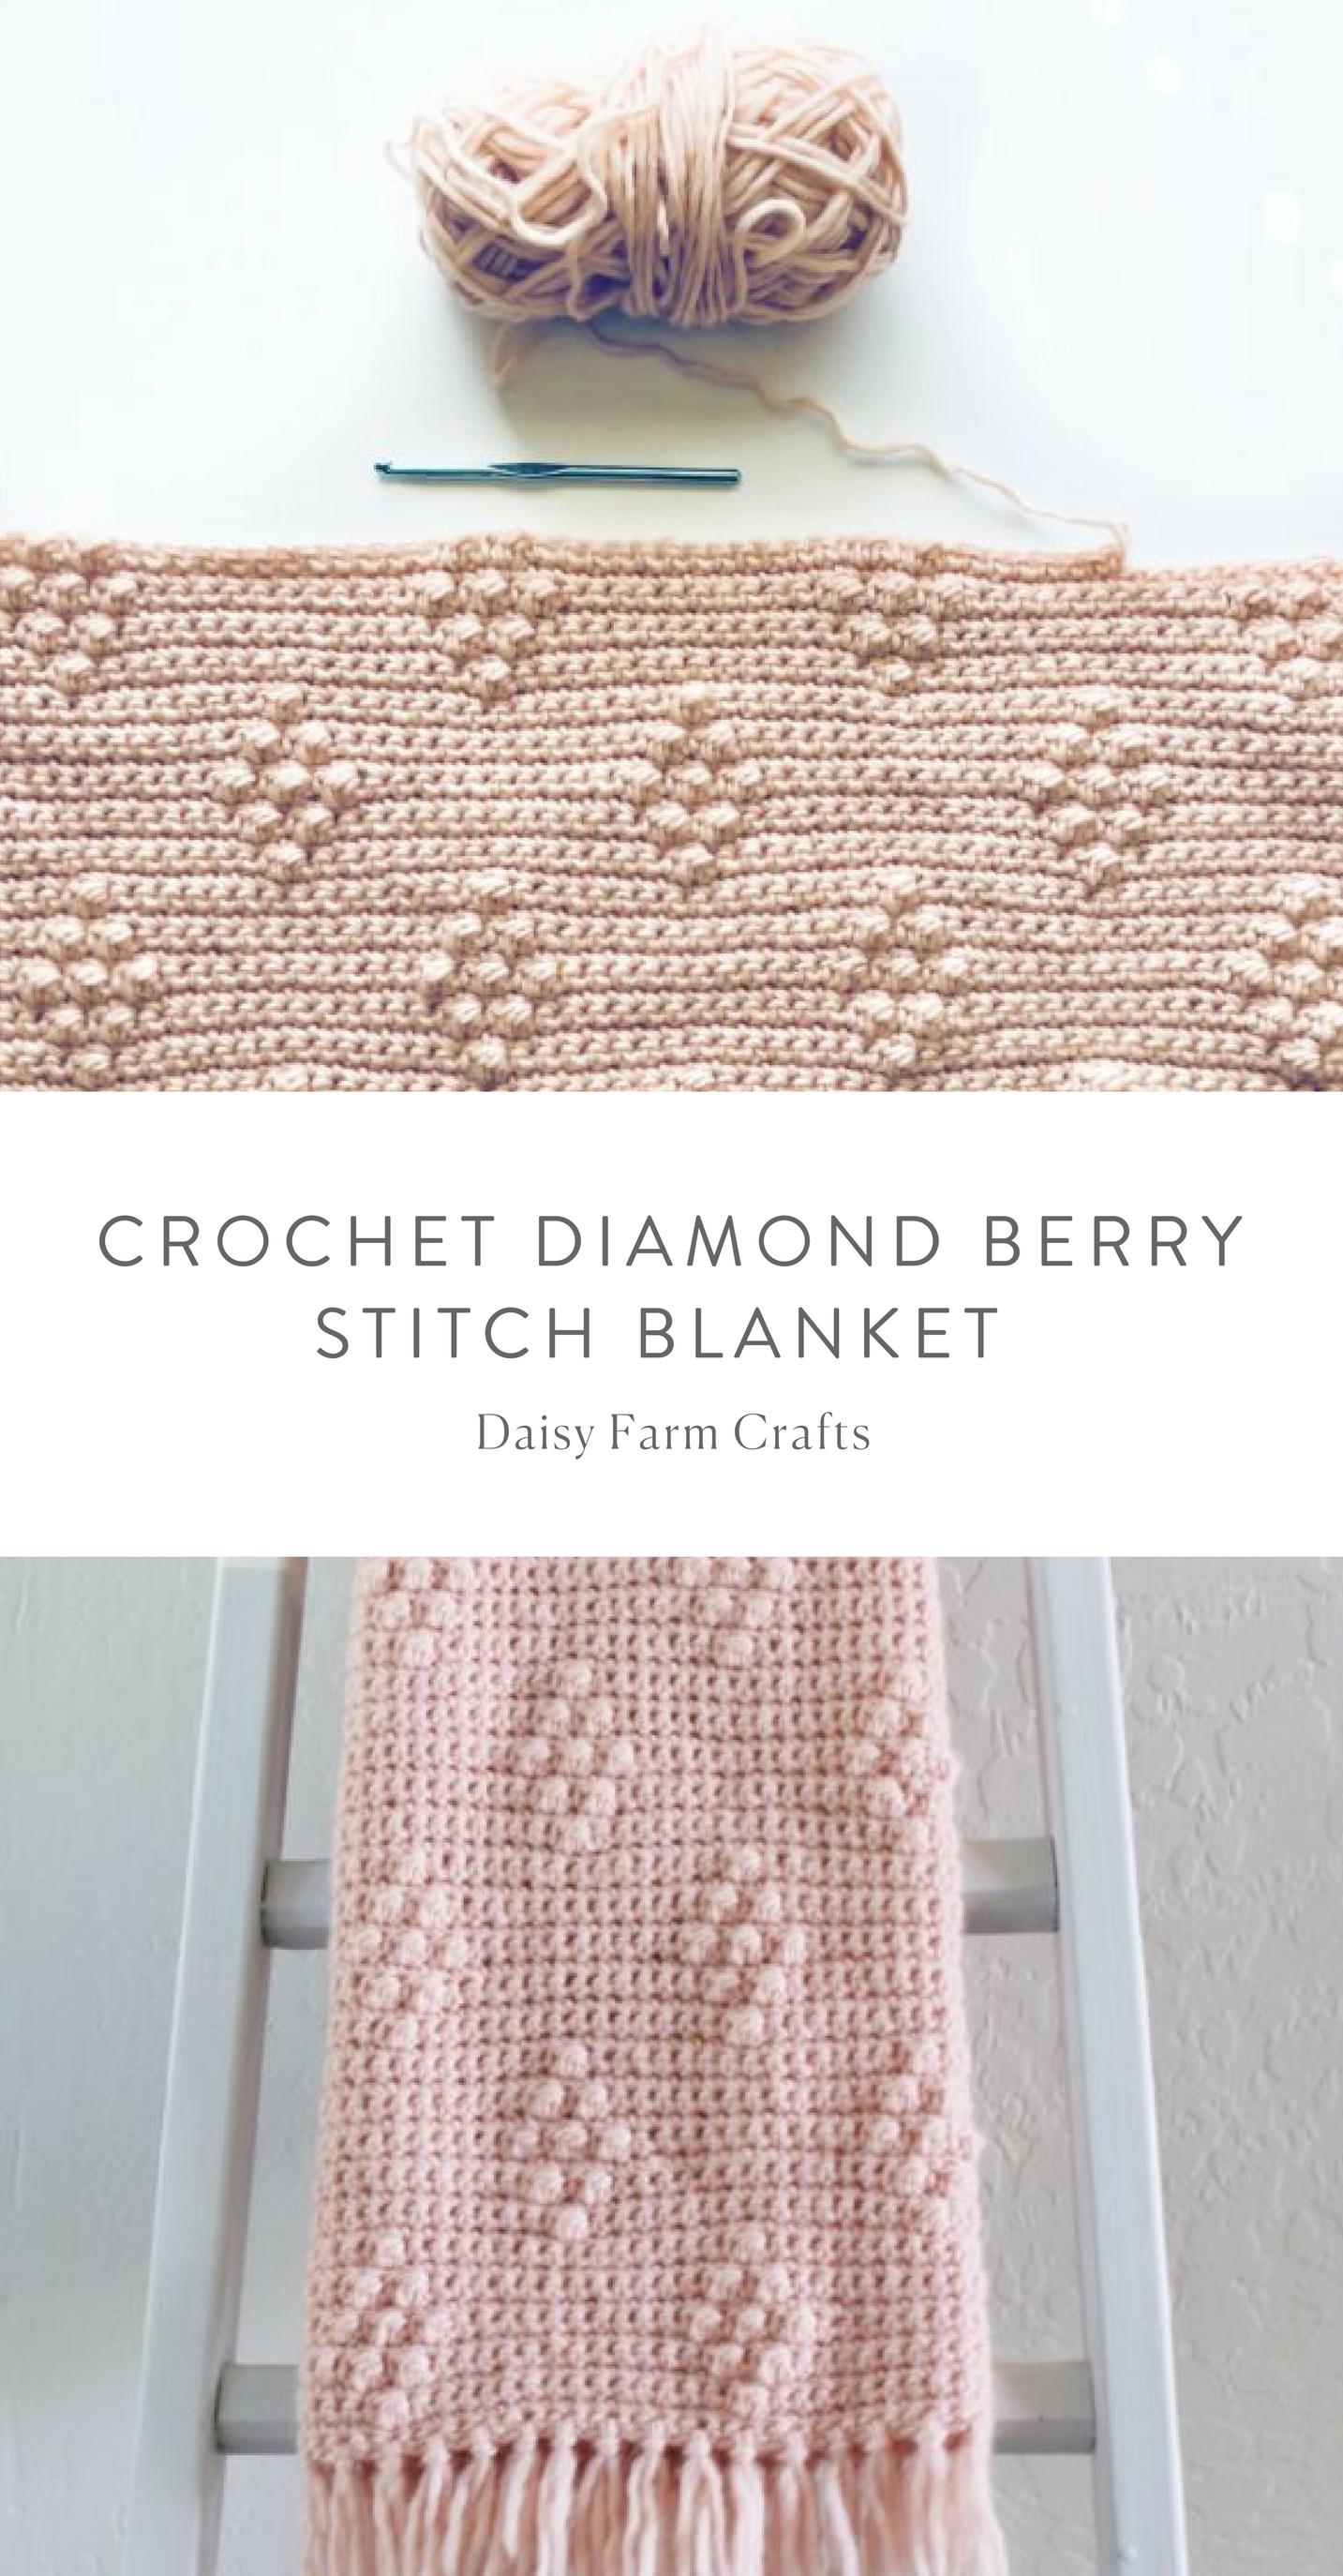 Crochet Diamond Berry Stitch Blanket | Daisy Farm Crafts | Pinterest ...